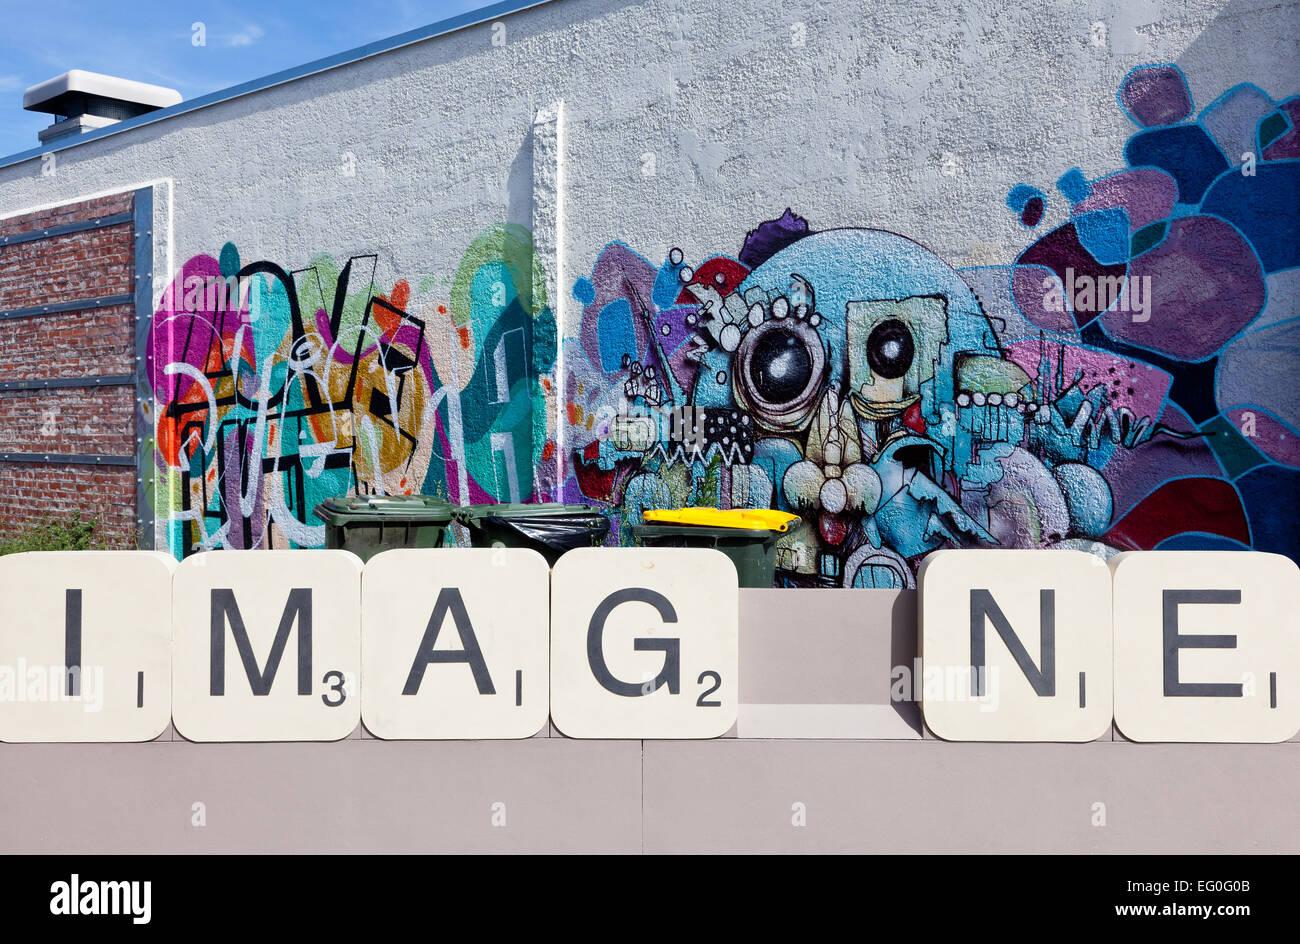 Graffiti wall christchurch - Imagine Street Art In Christchurch New Zealand Stock